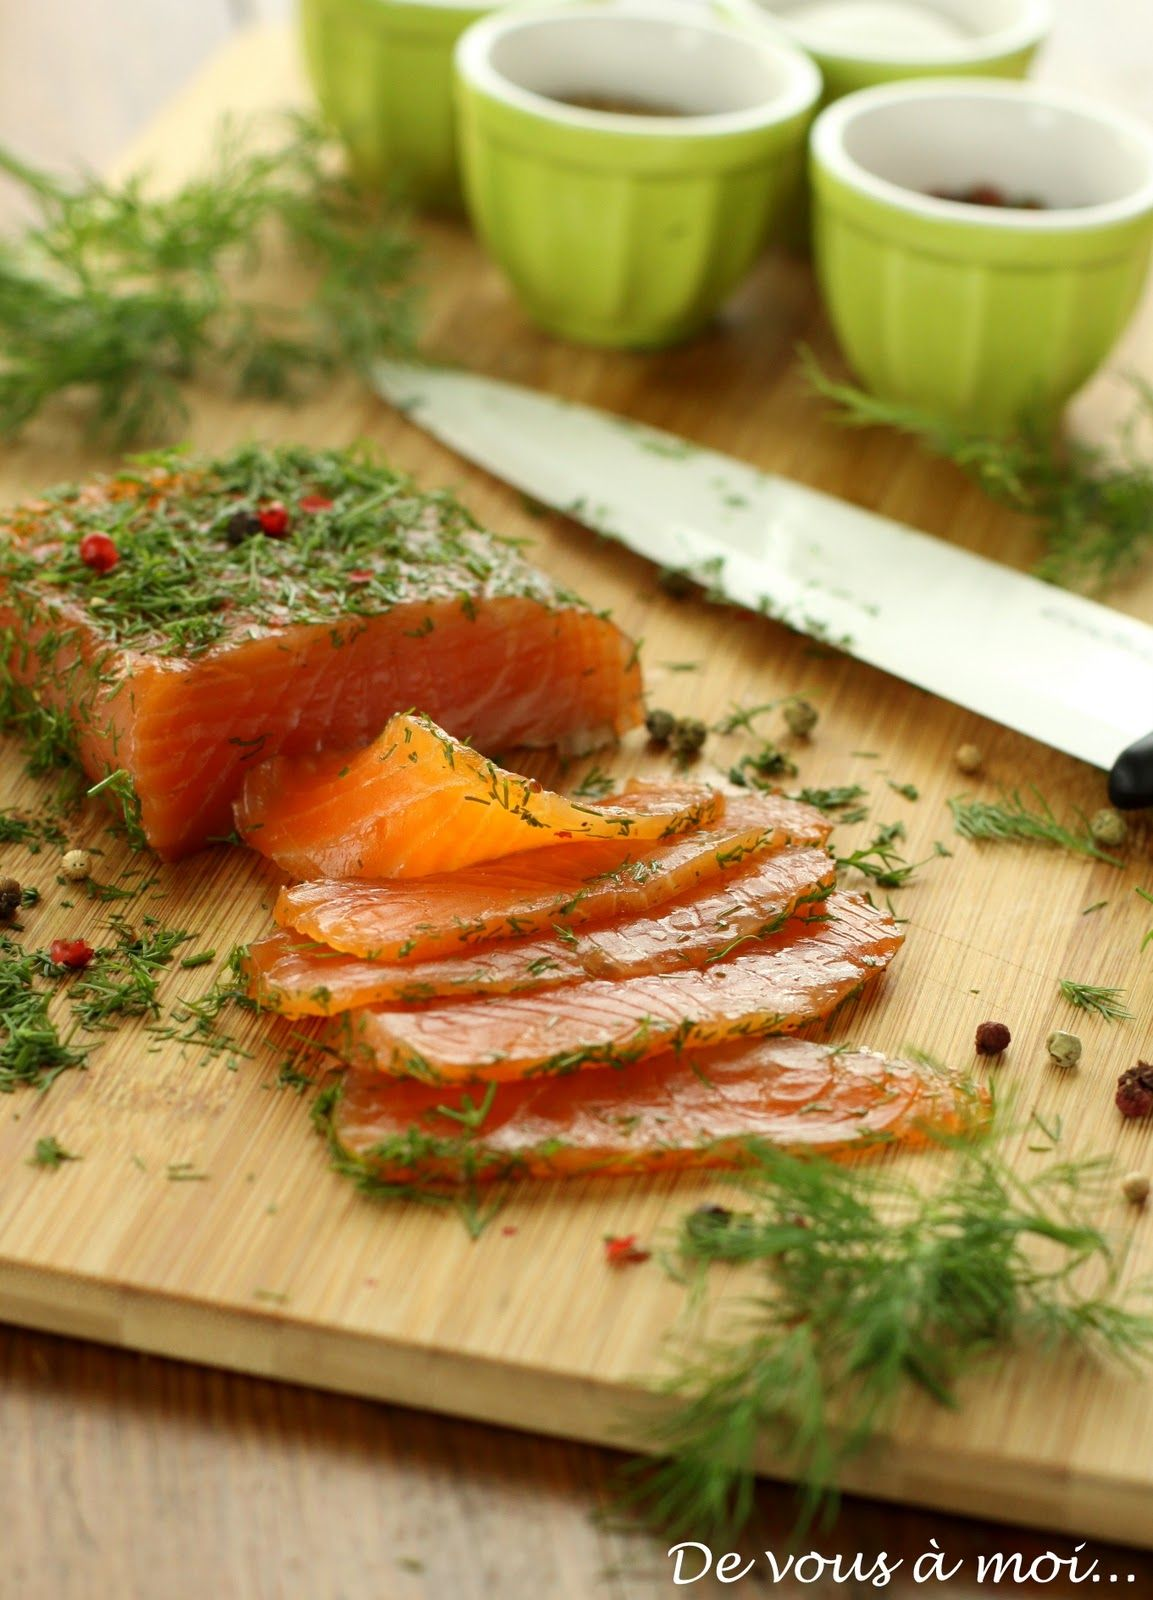 Recette de saumon marine gravlax